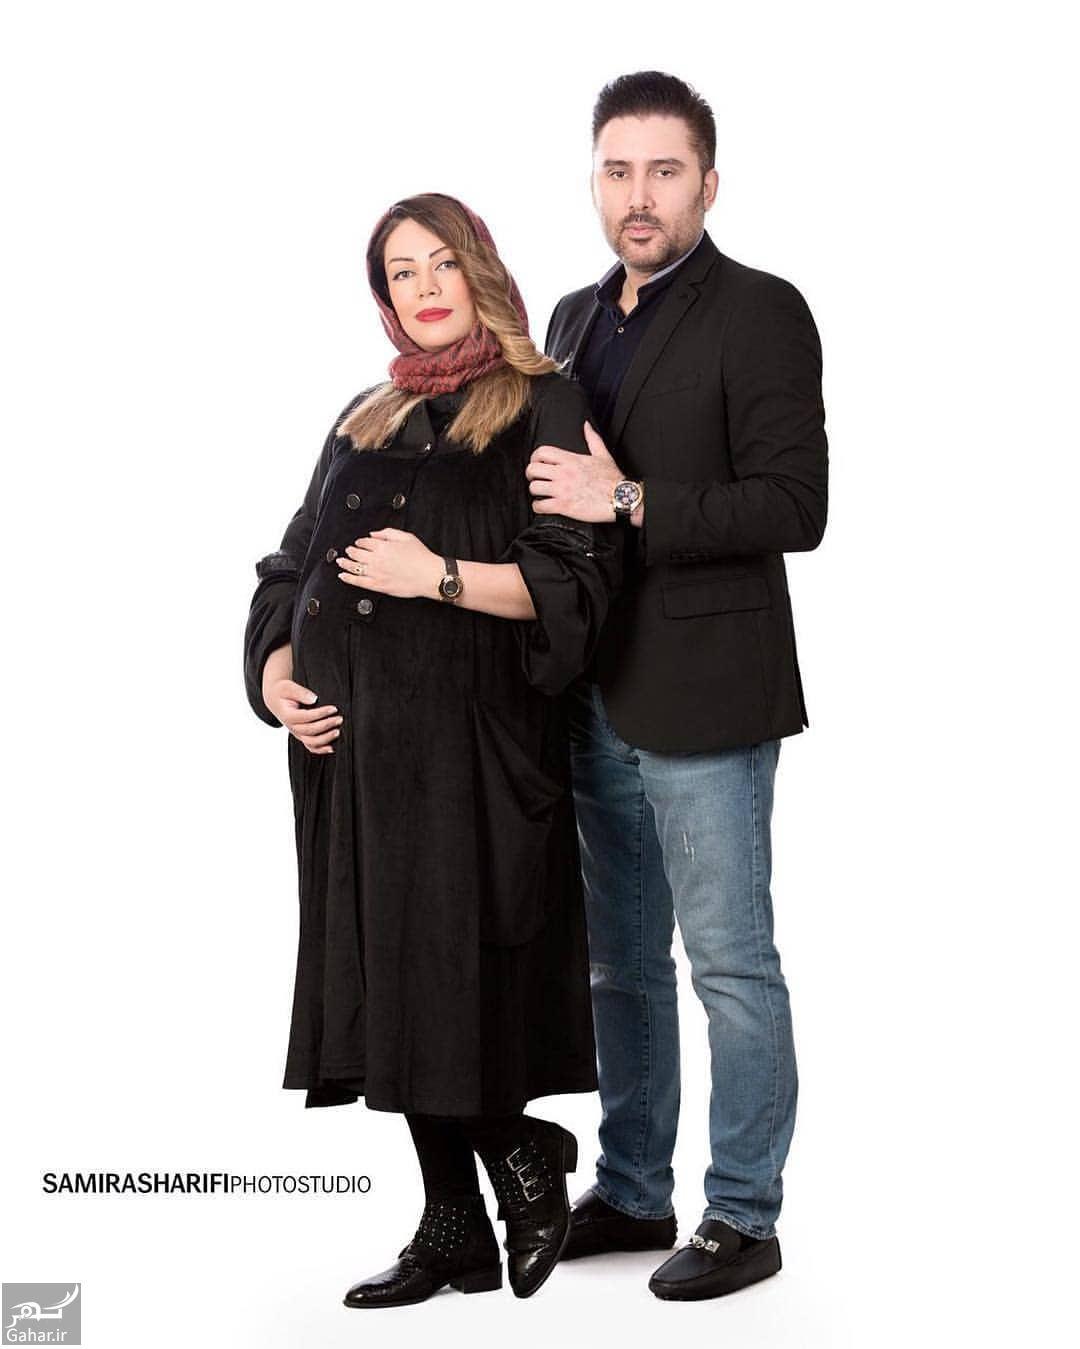 438329 Gahar ir نیما مسیحا پدر می شود + عکس همسرش